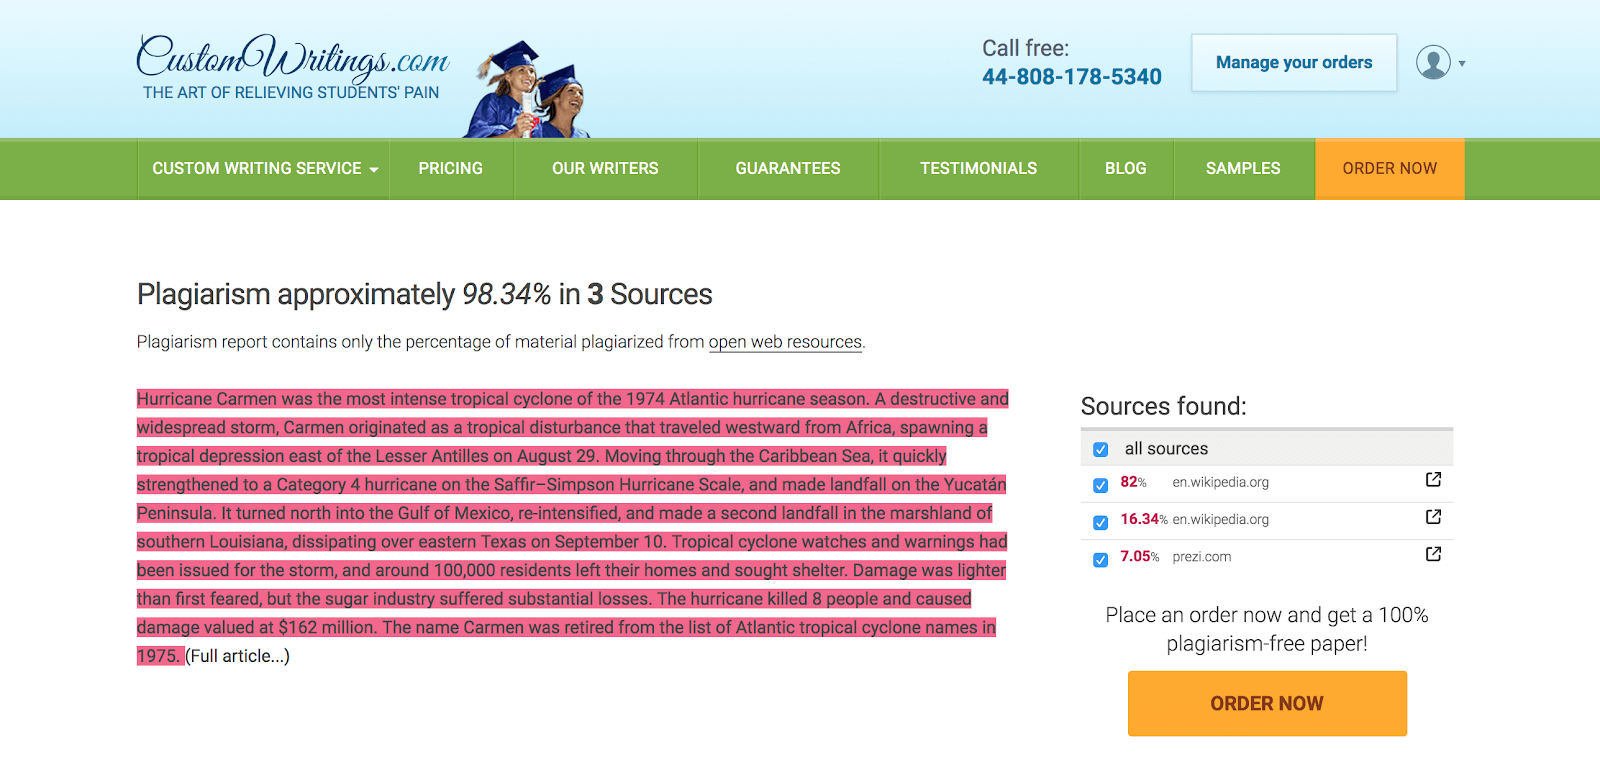 Customwritings.com plagiarism